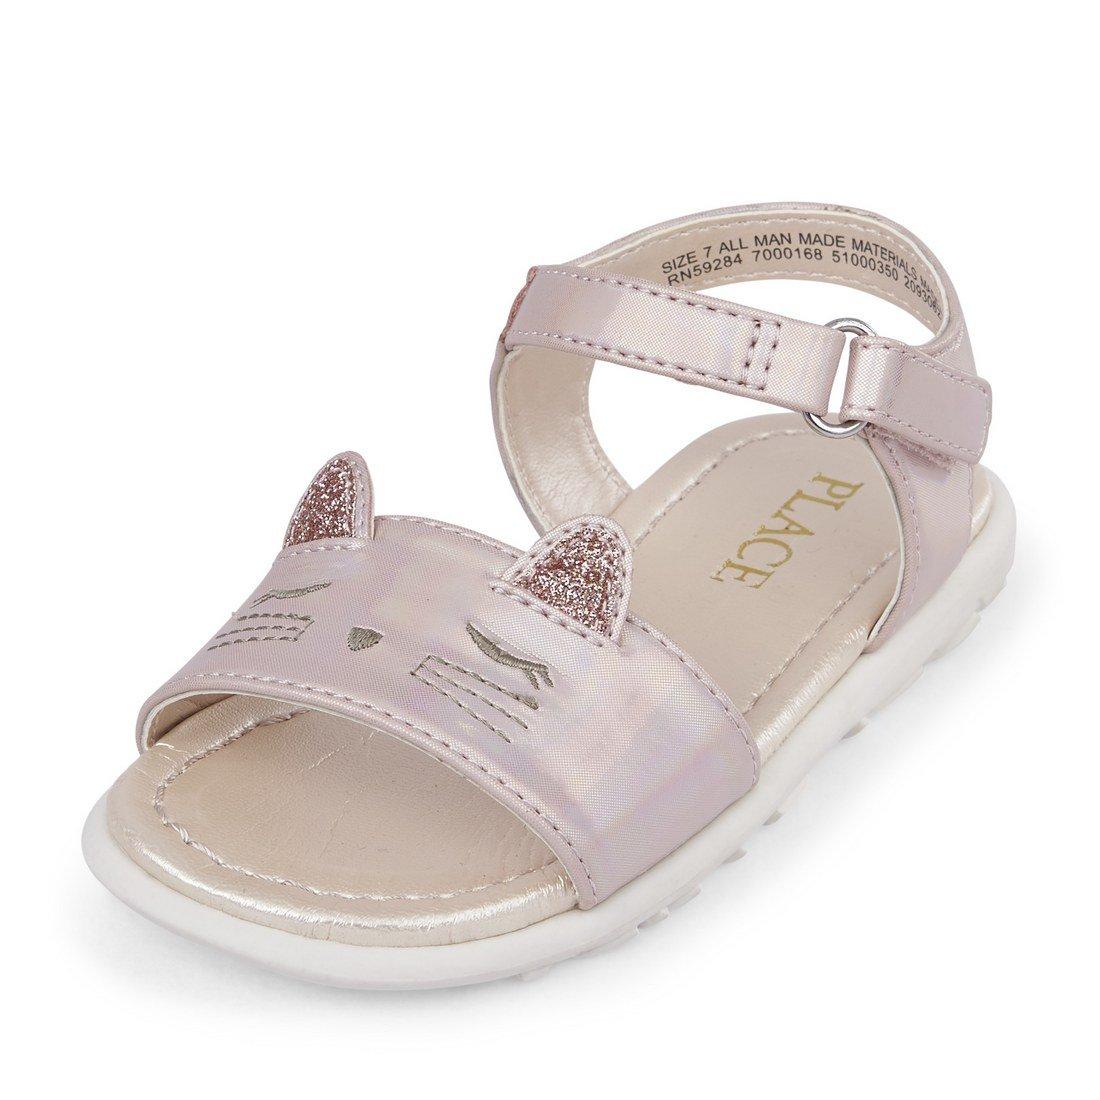 The Children's Place Girls' TG Cat Canary Flat Sandal, Pink, TDDLR 6 Medium US Big Kid